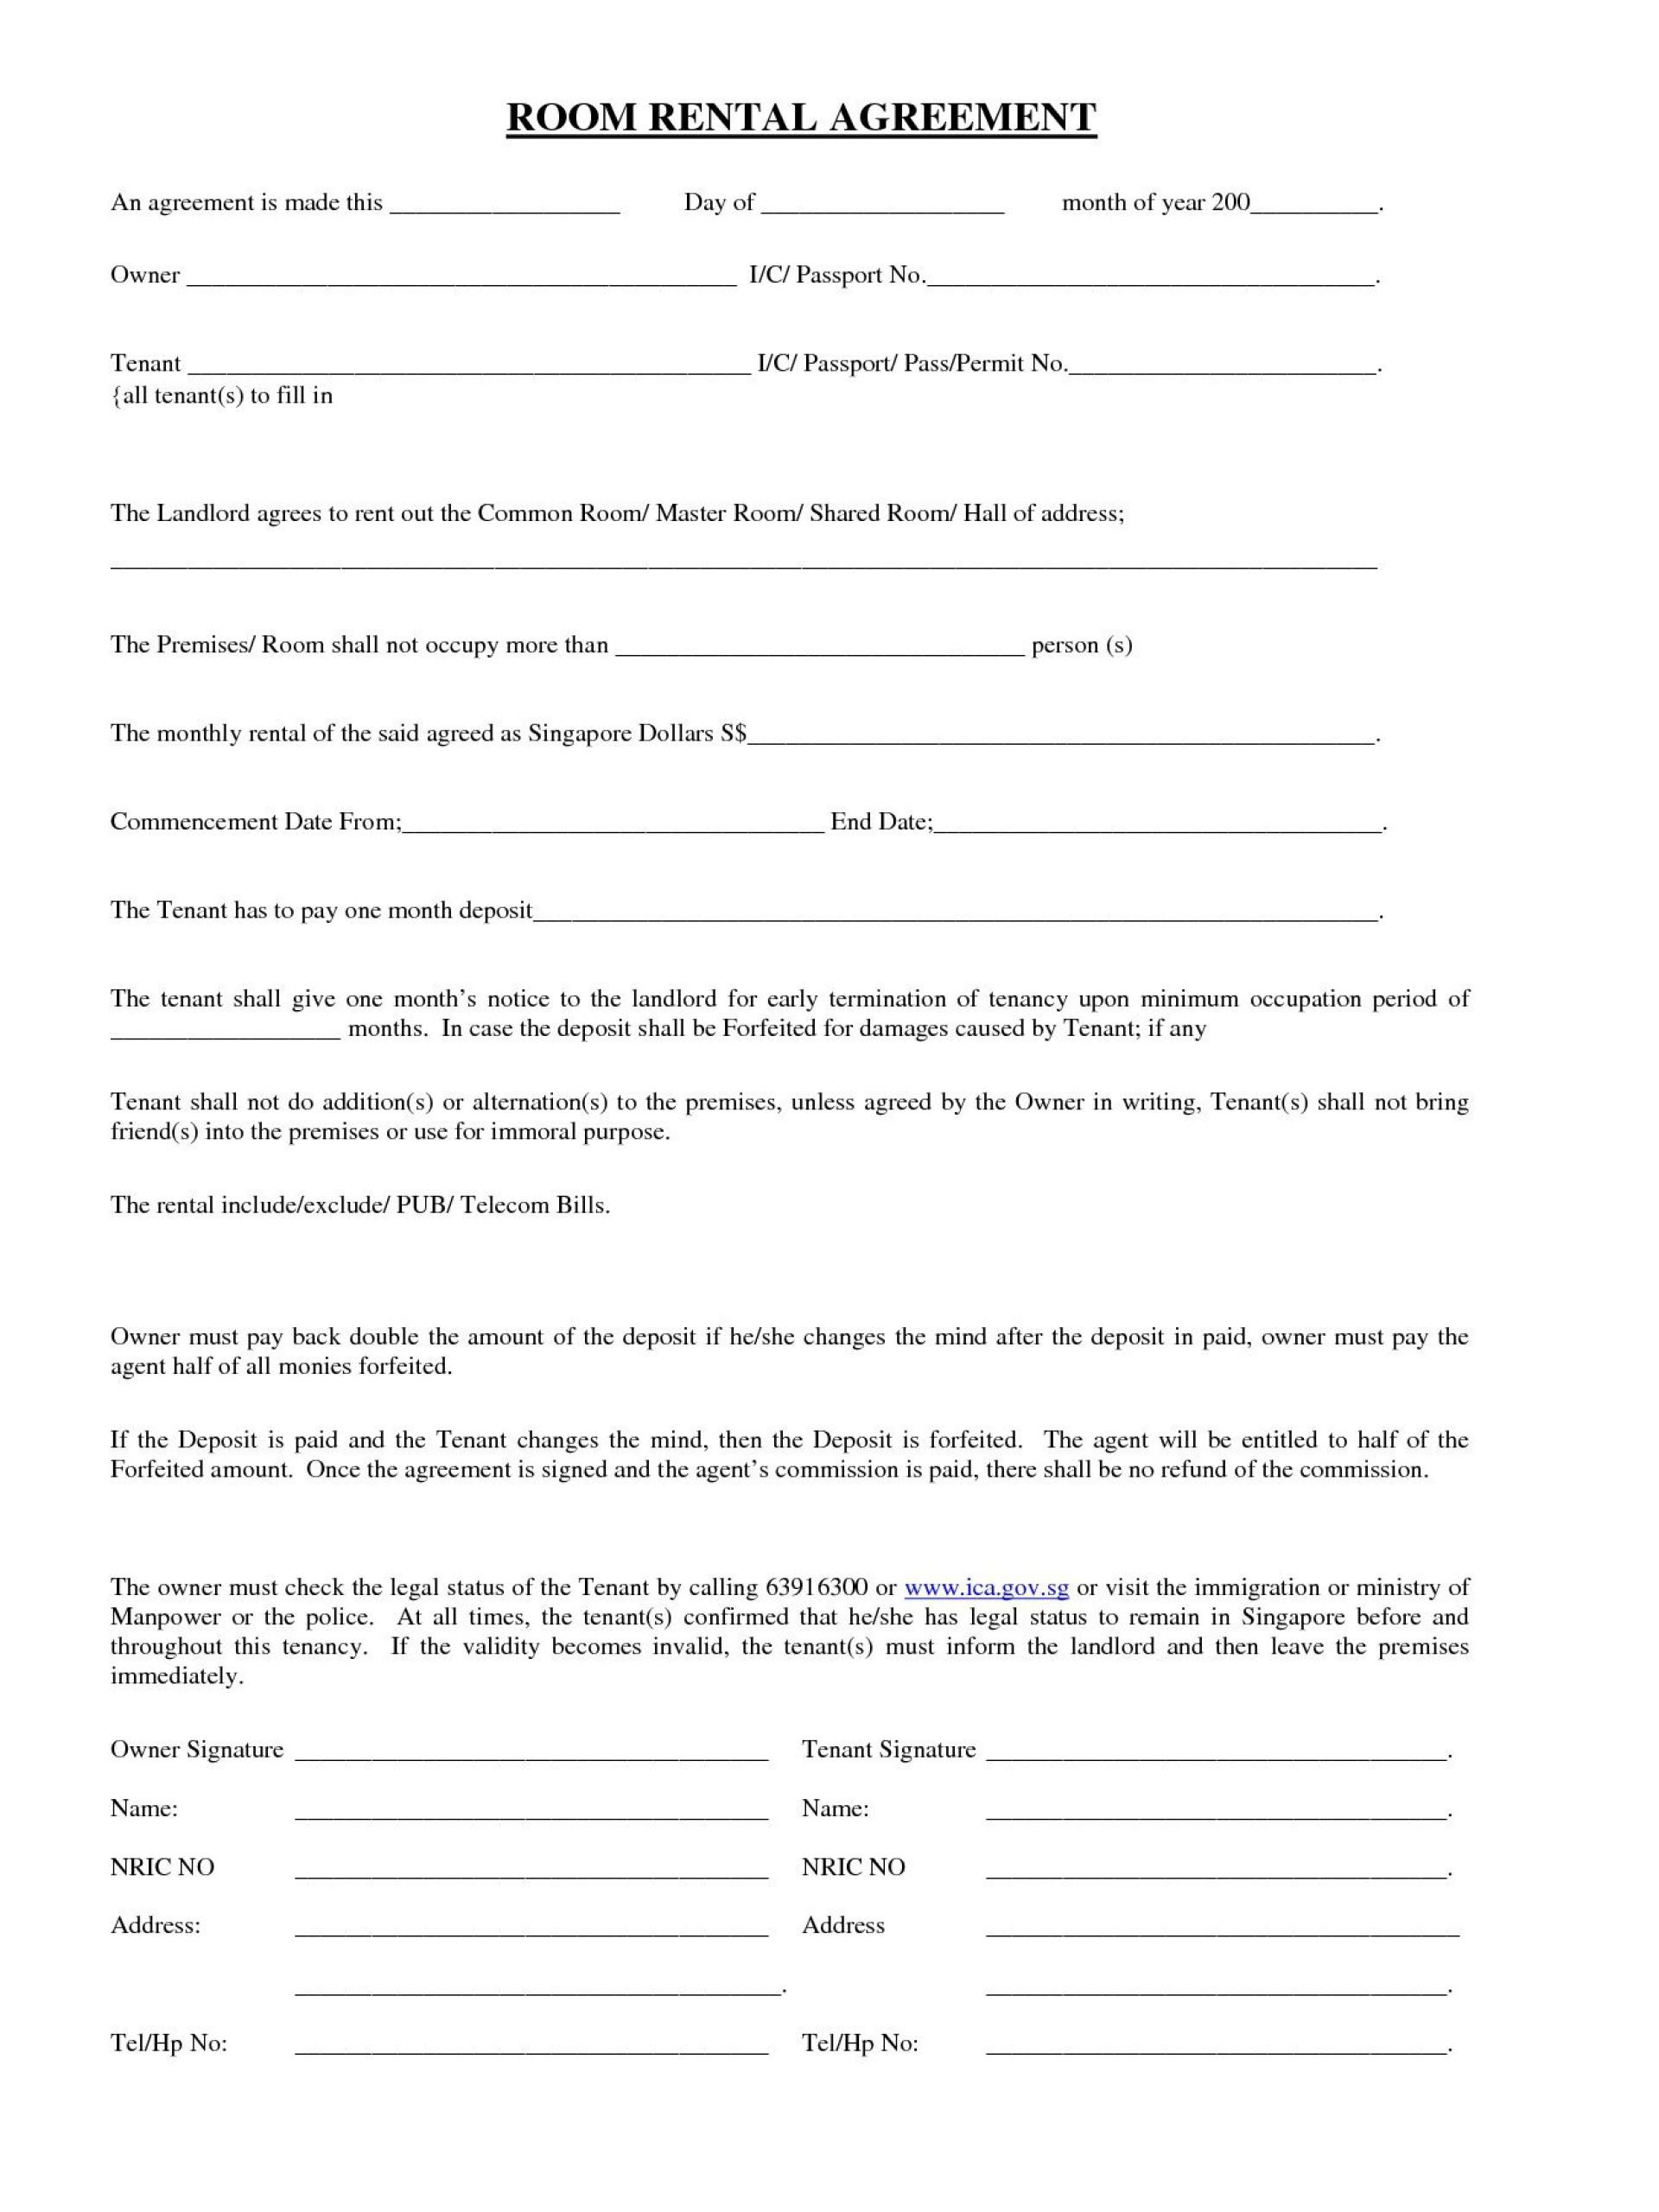 003 Sensational Apartment Rental Application Template Design  Free Form Ontario1920